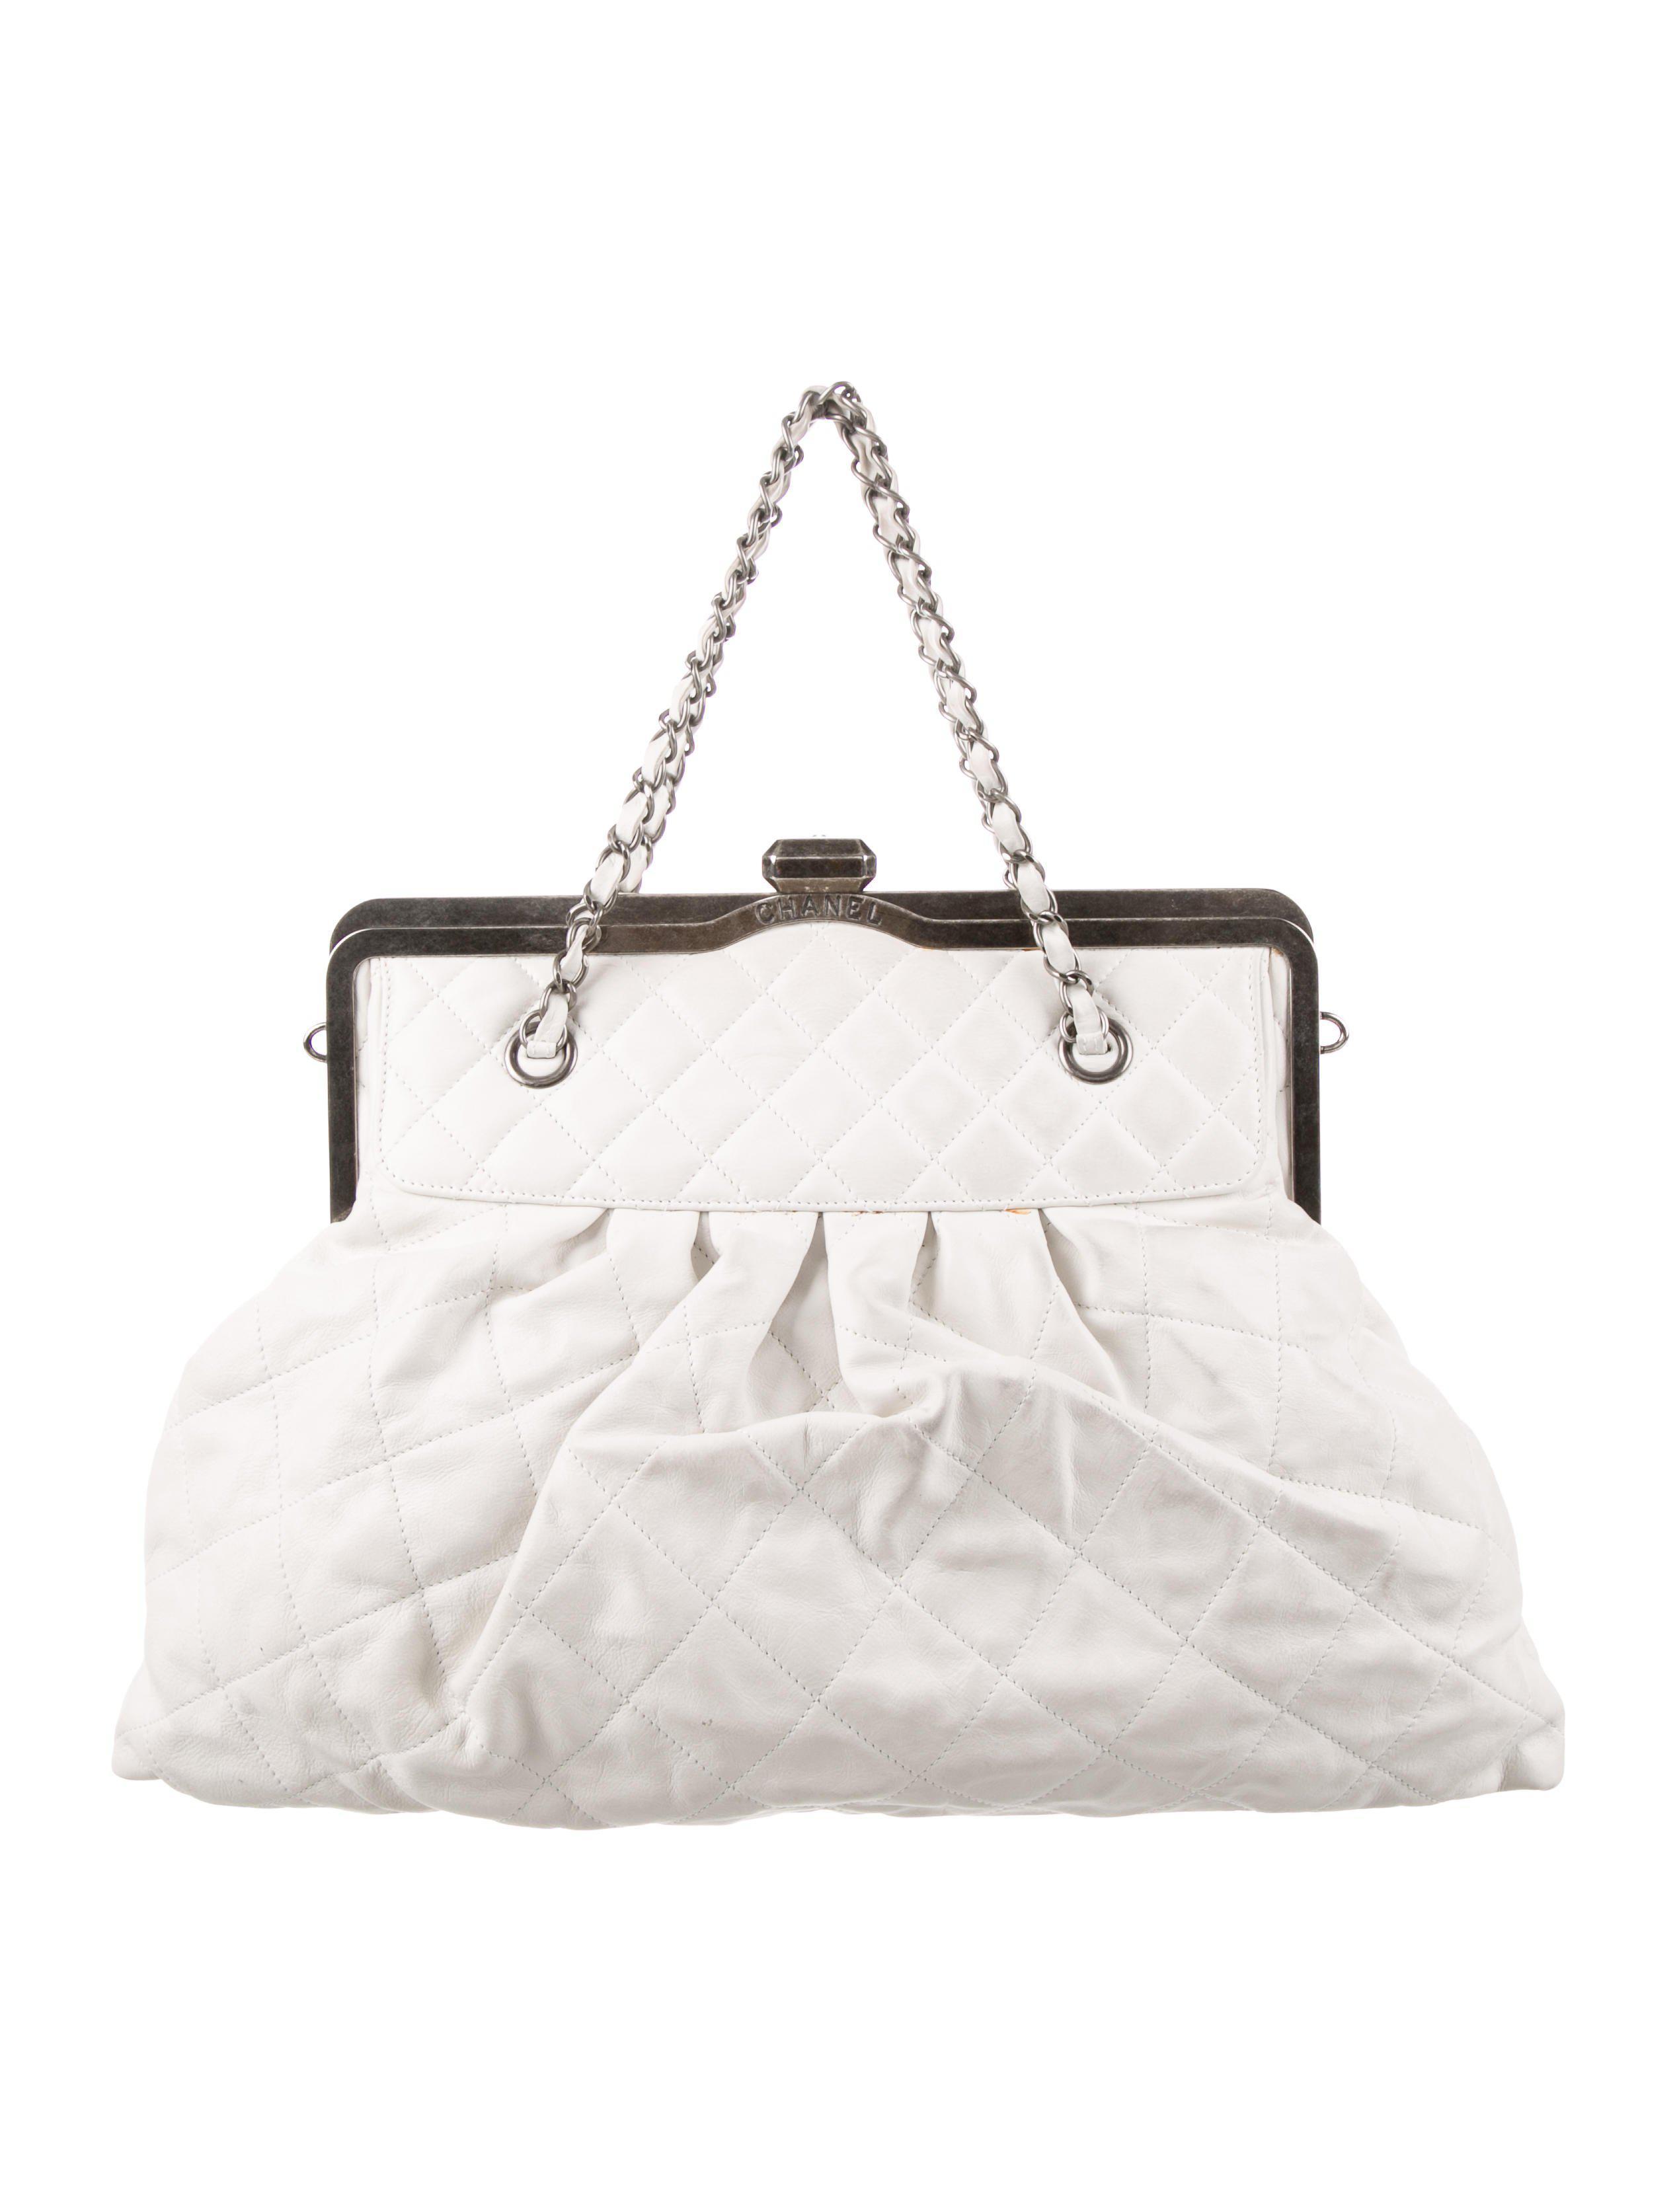 Lyst - Chanel Mademoiselle Frame Satchel White in Metallic 236a83428c2b3